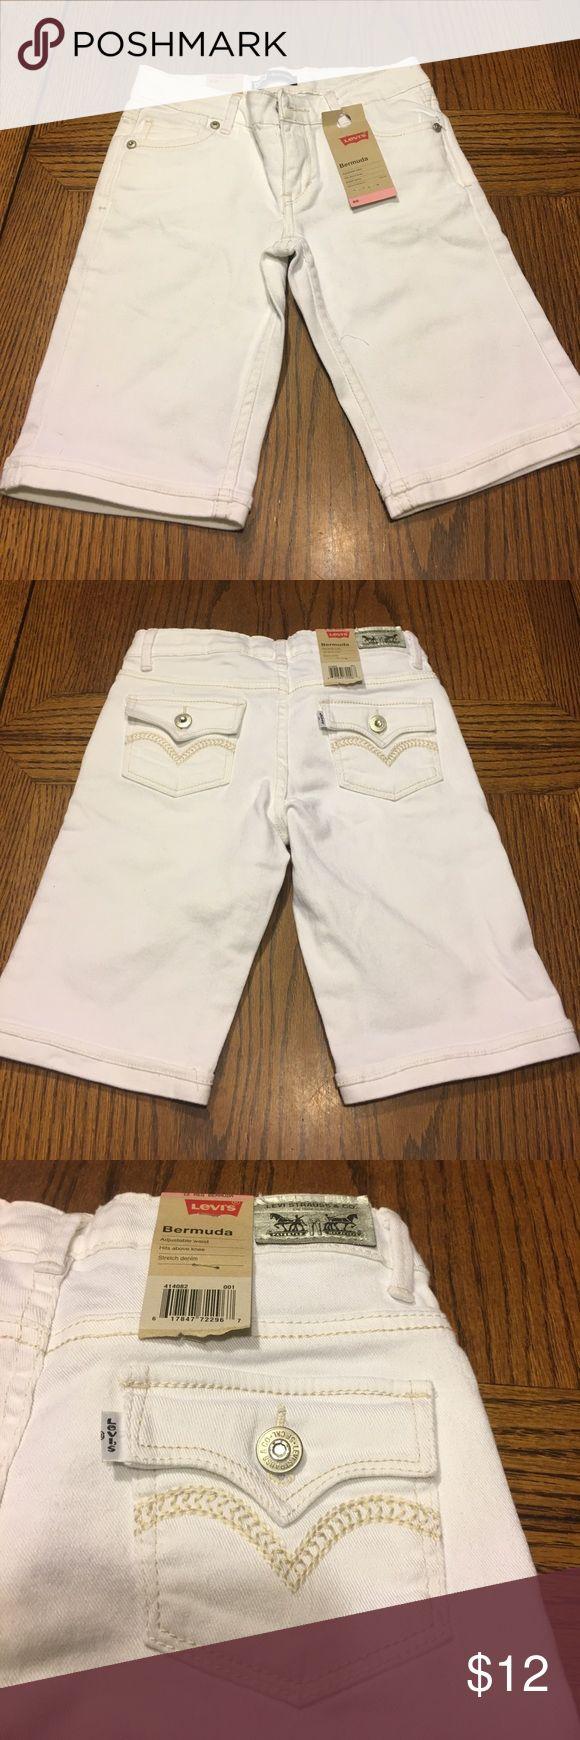 Girls Levi's Bermuda Shorts NWT Girls Levi's Bermuda Shorts. White size 12 Levi's Bottoms Shorts